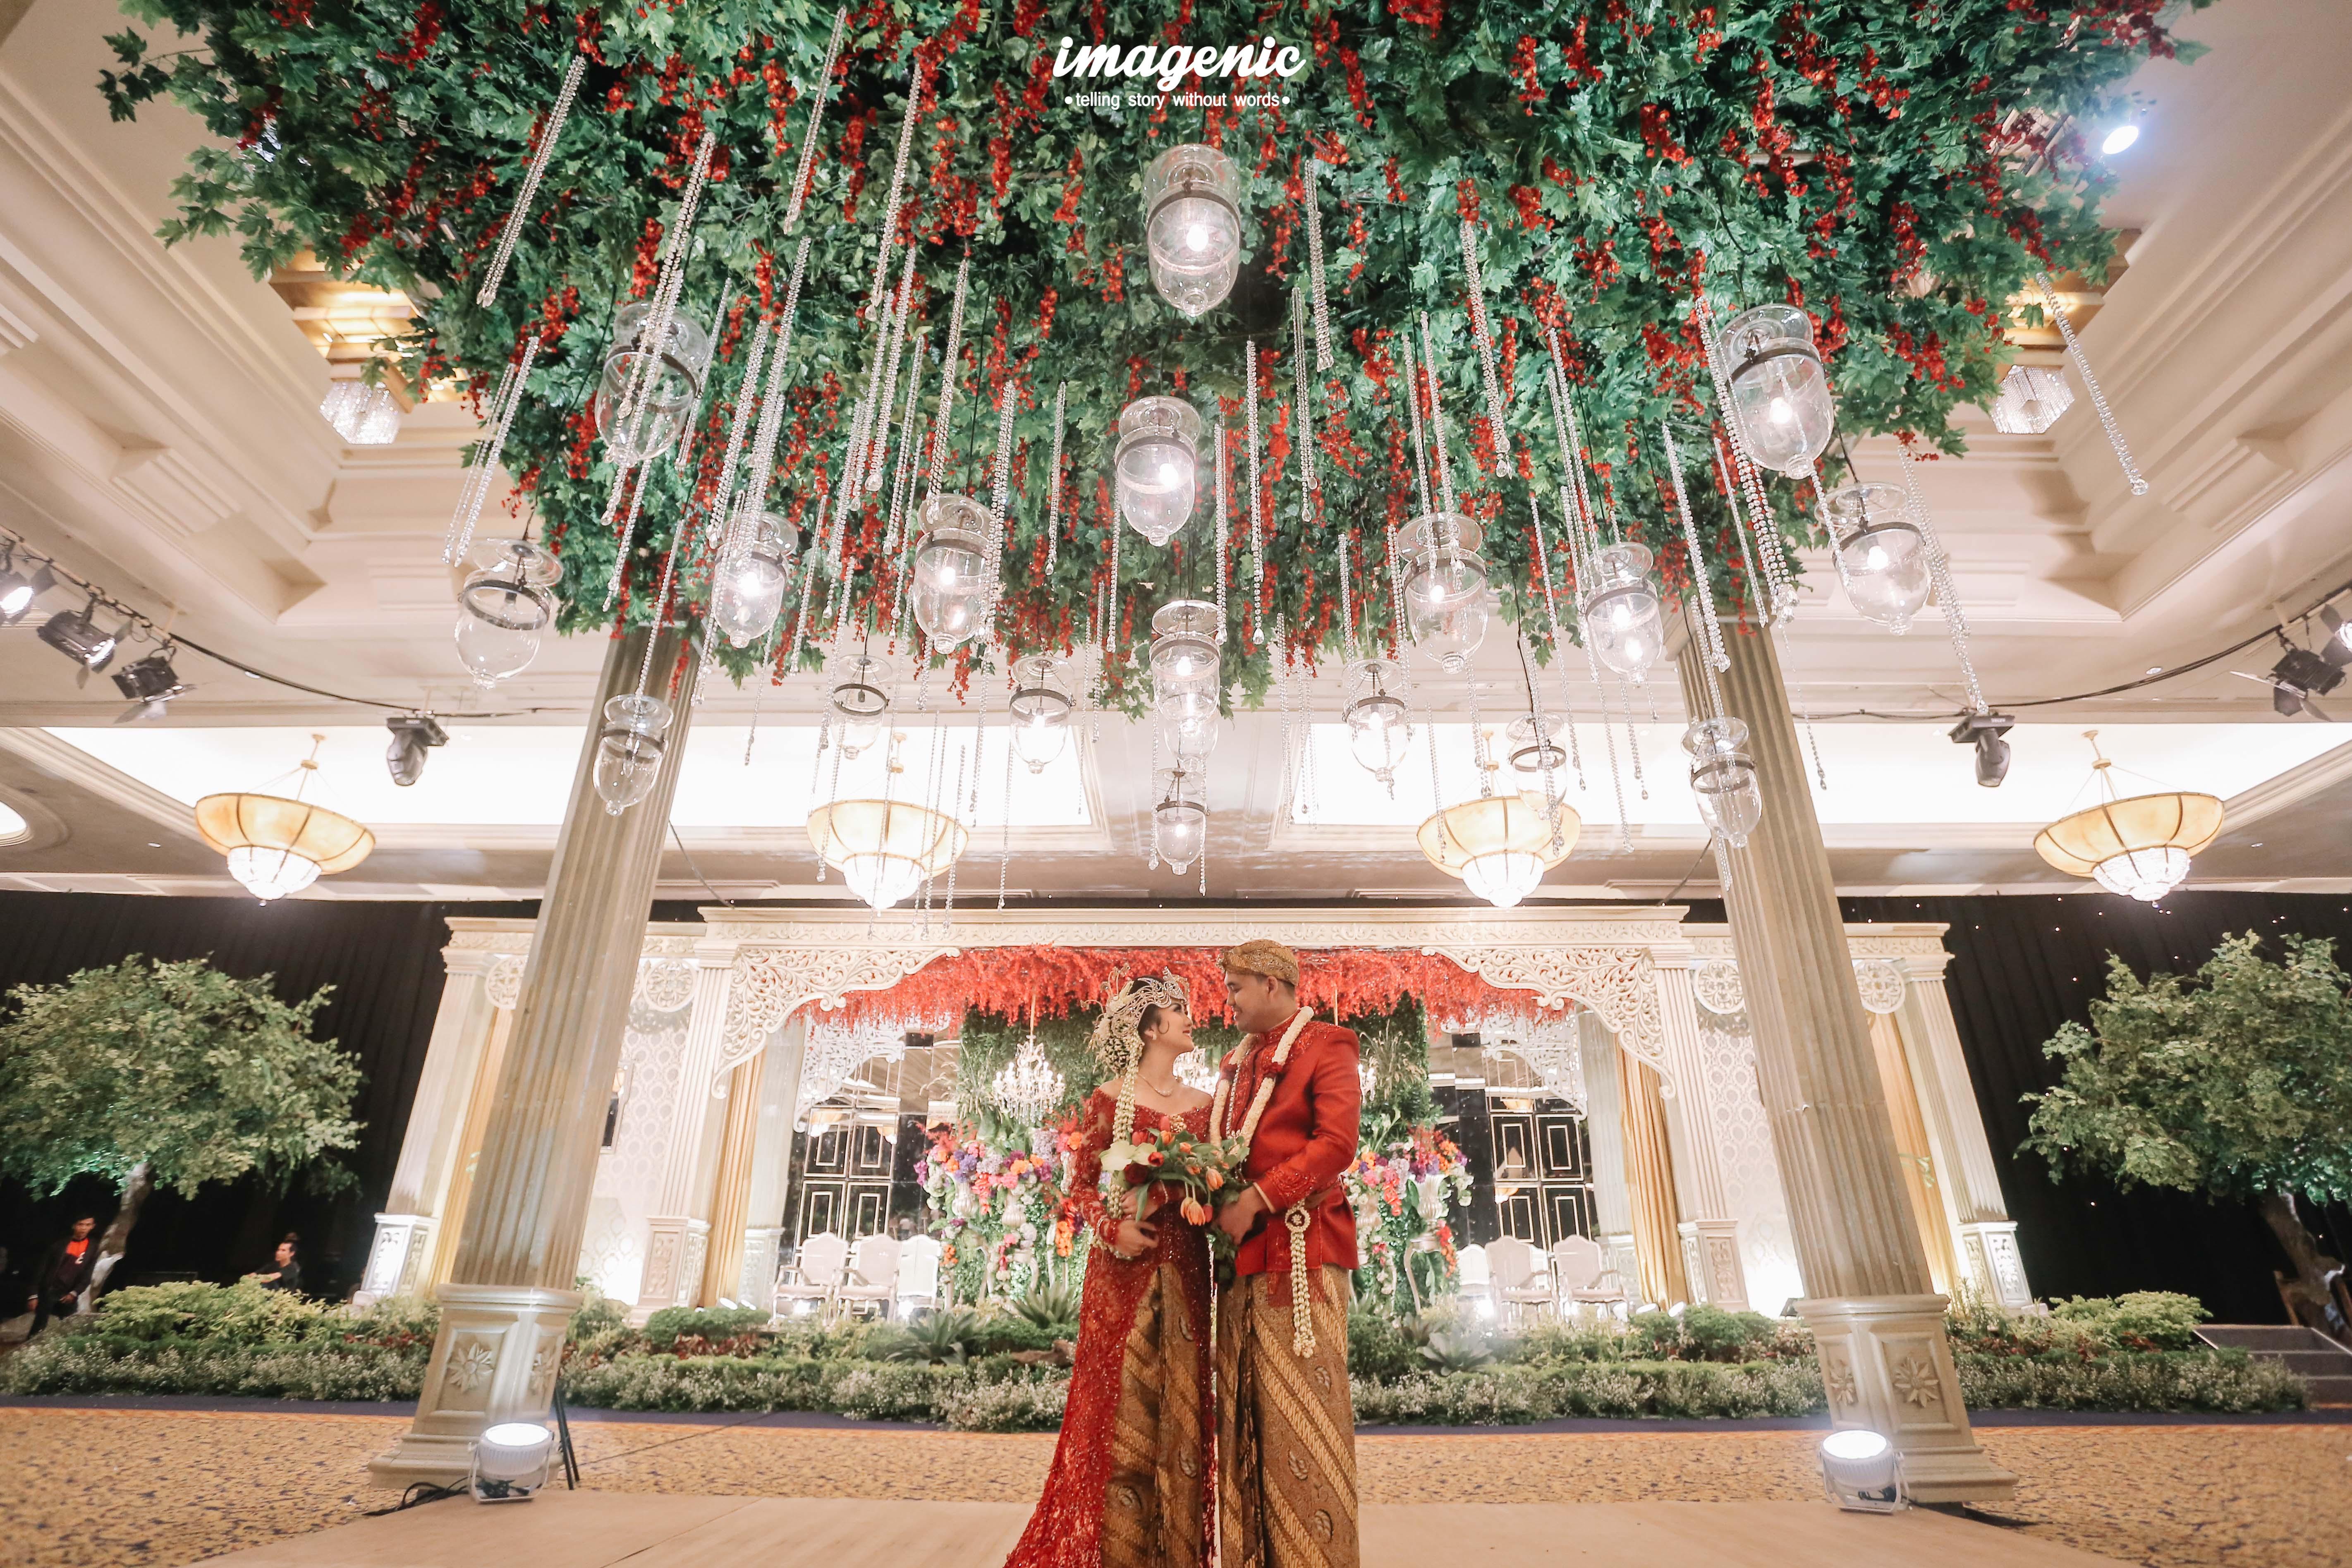 Rumah kampung wedding decoration lighting in jakarta rumah kampung wedding decoration lighting in jakarta bridestory junglespirit Gallery